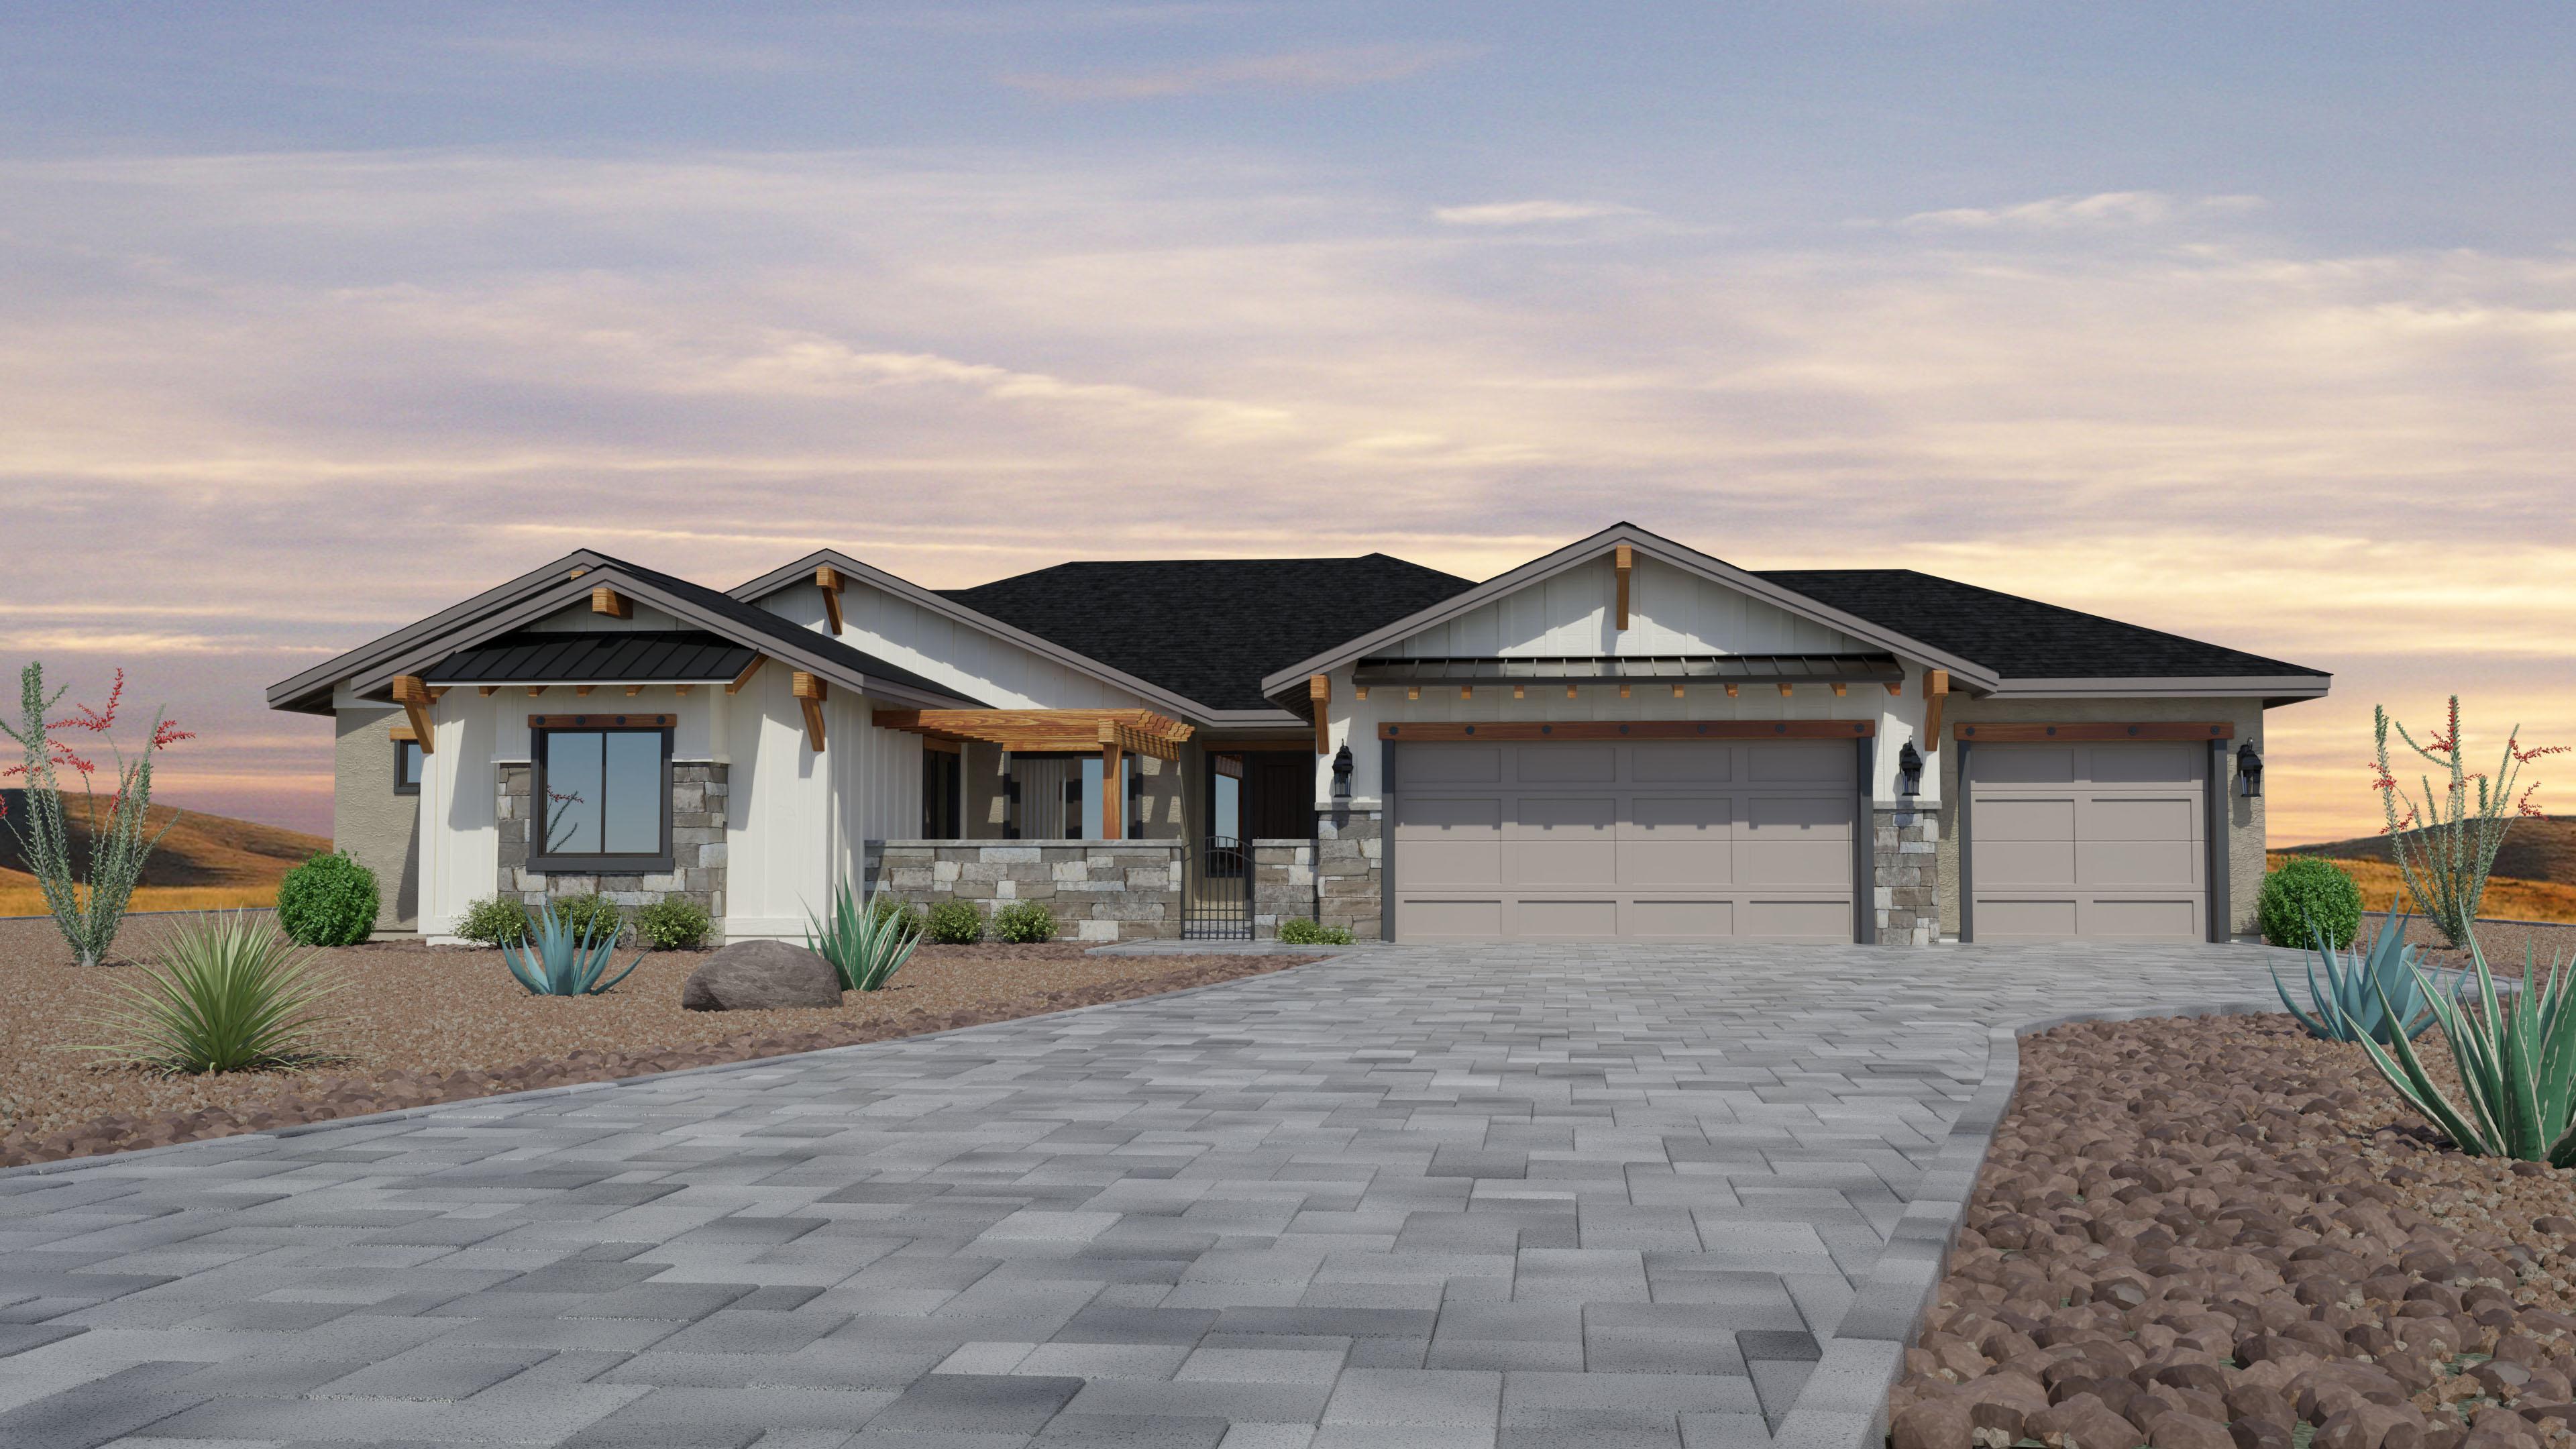 Exterior featured in the Jasper Featured Plan 3020 By Capstone Homes in Prescott, AZ